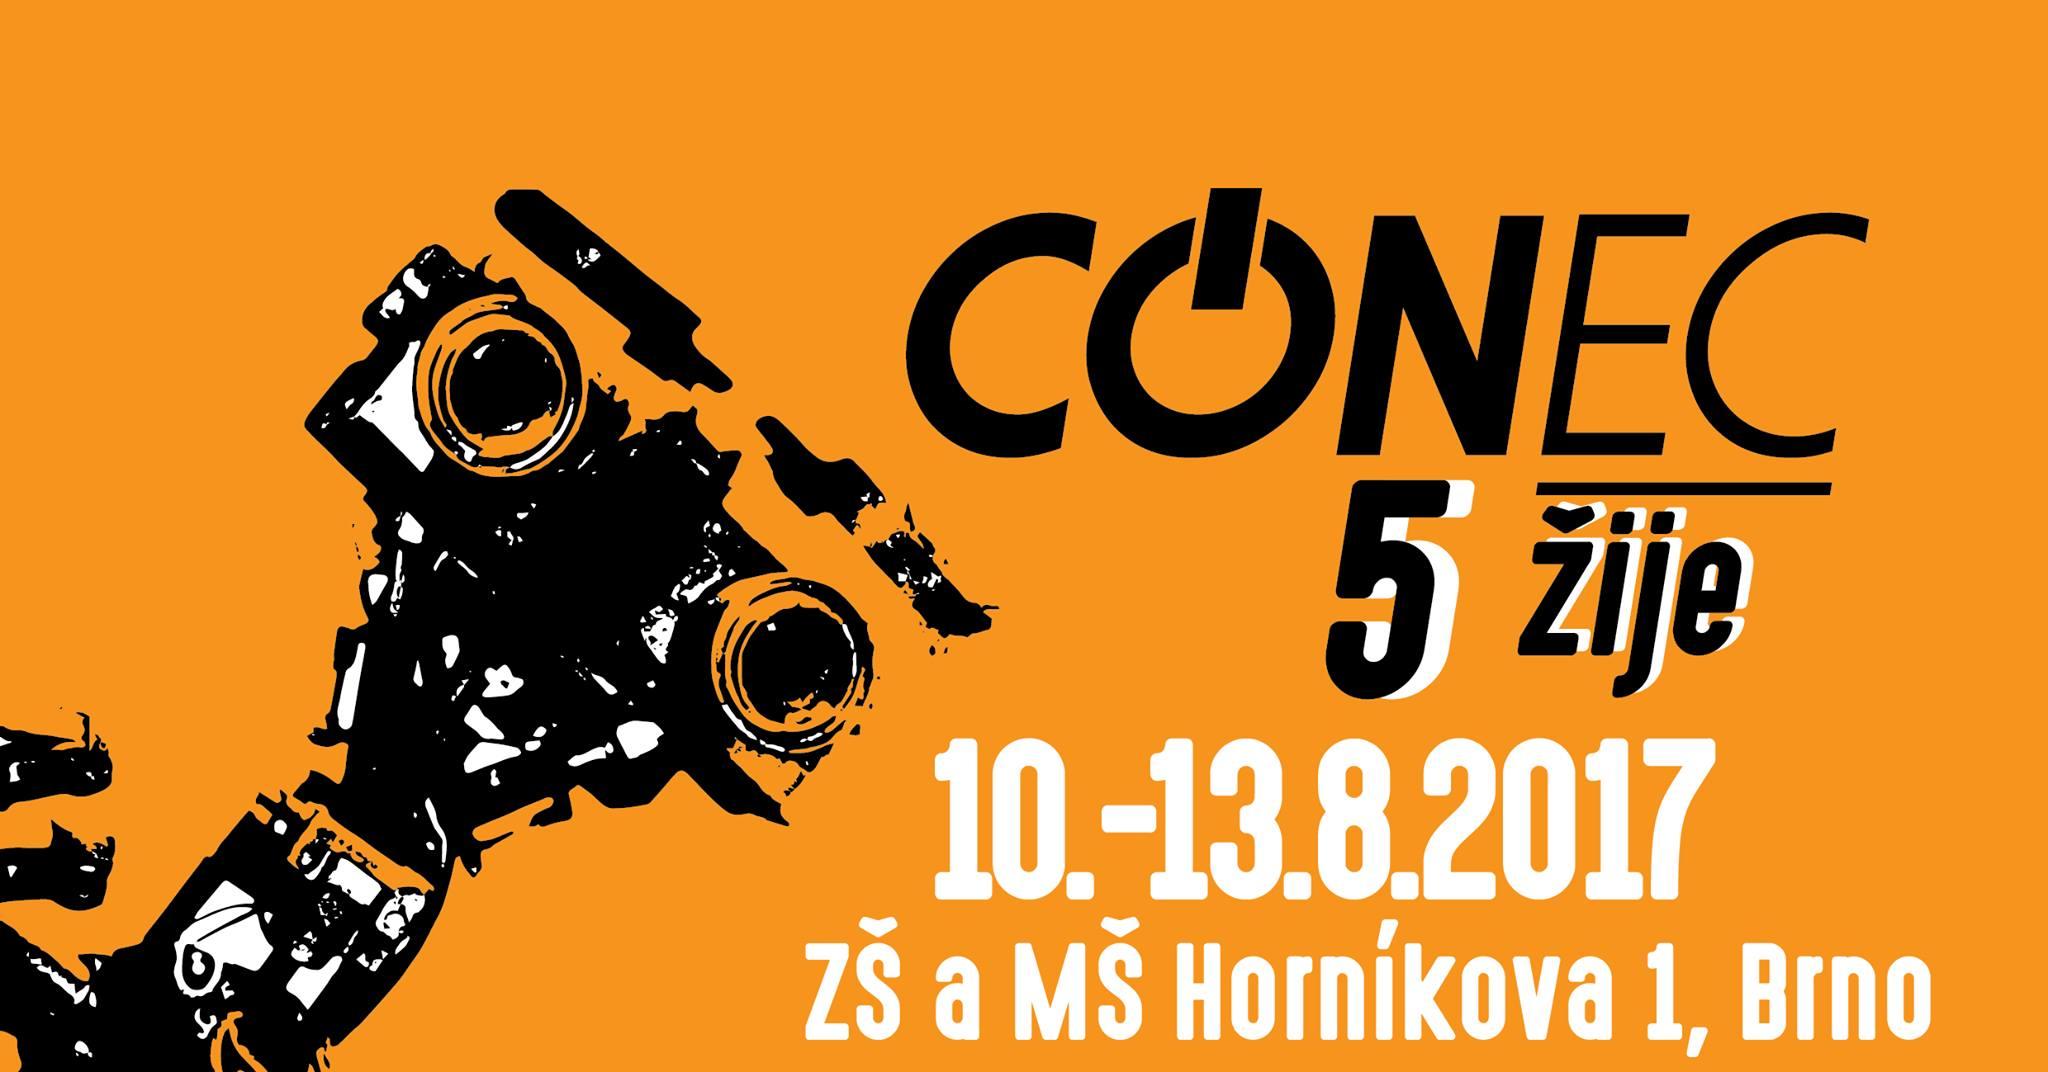 ConEc